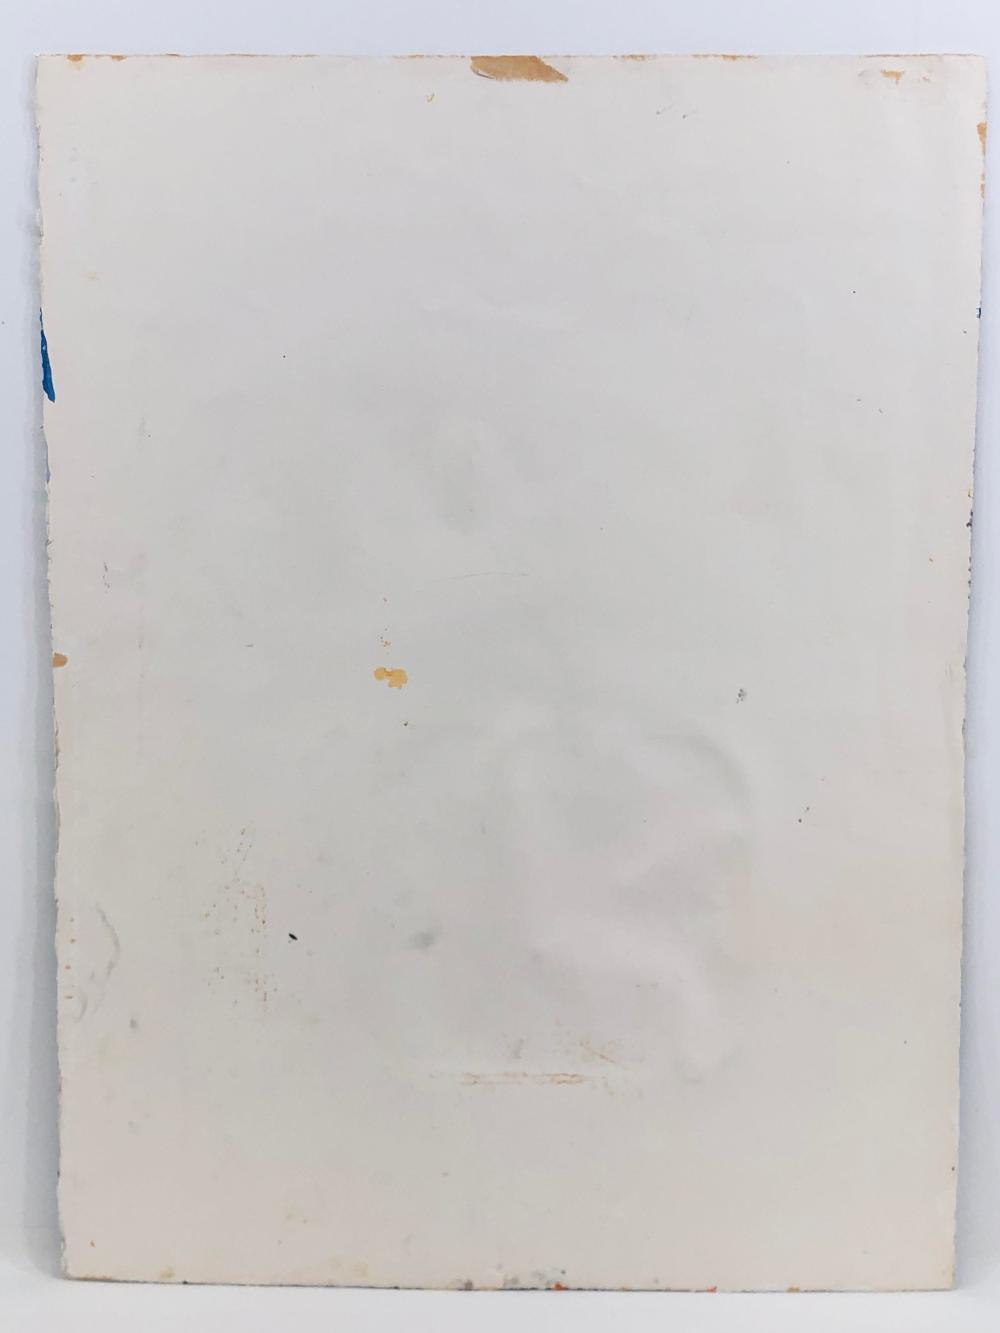 MICHAEL MAIER POP ART MIXED MEDIA ON CANVAS